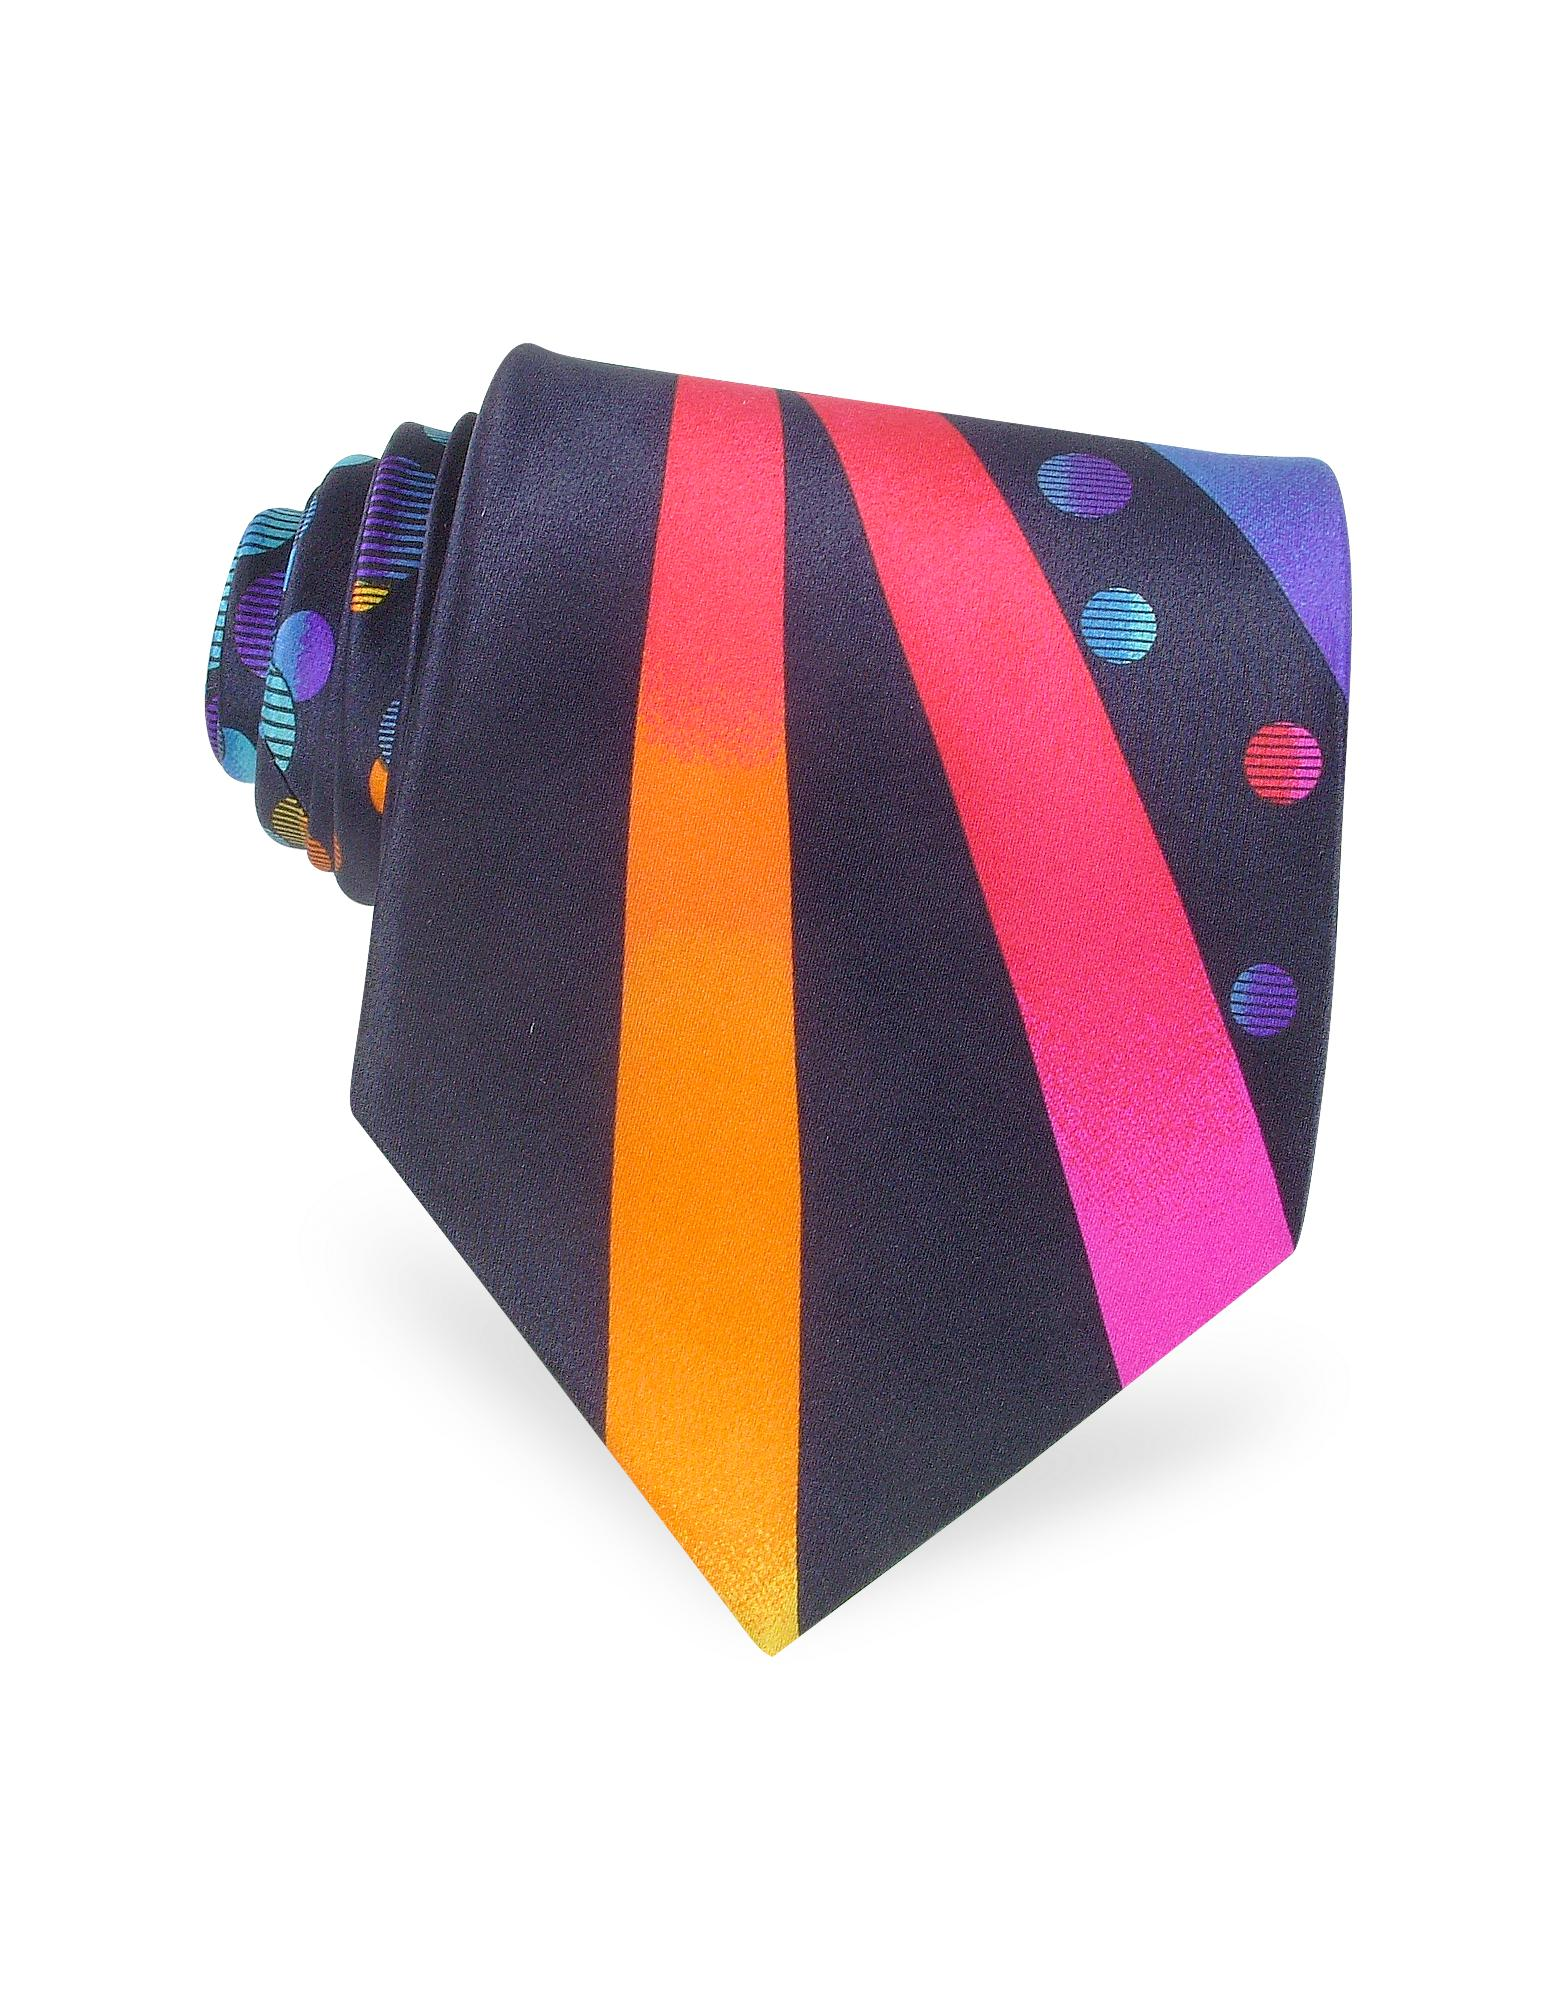 Vitaliano Pancaldi  Handmade Ornamental Printed Silk Tie